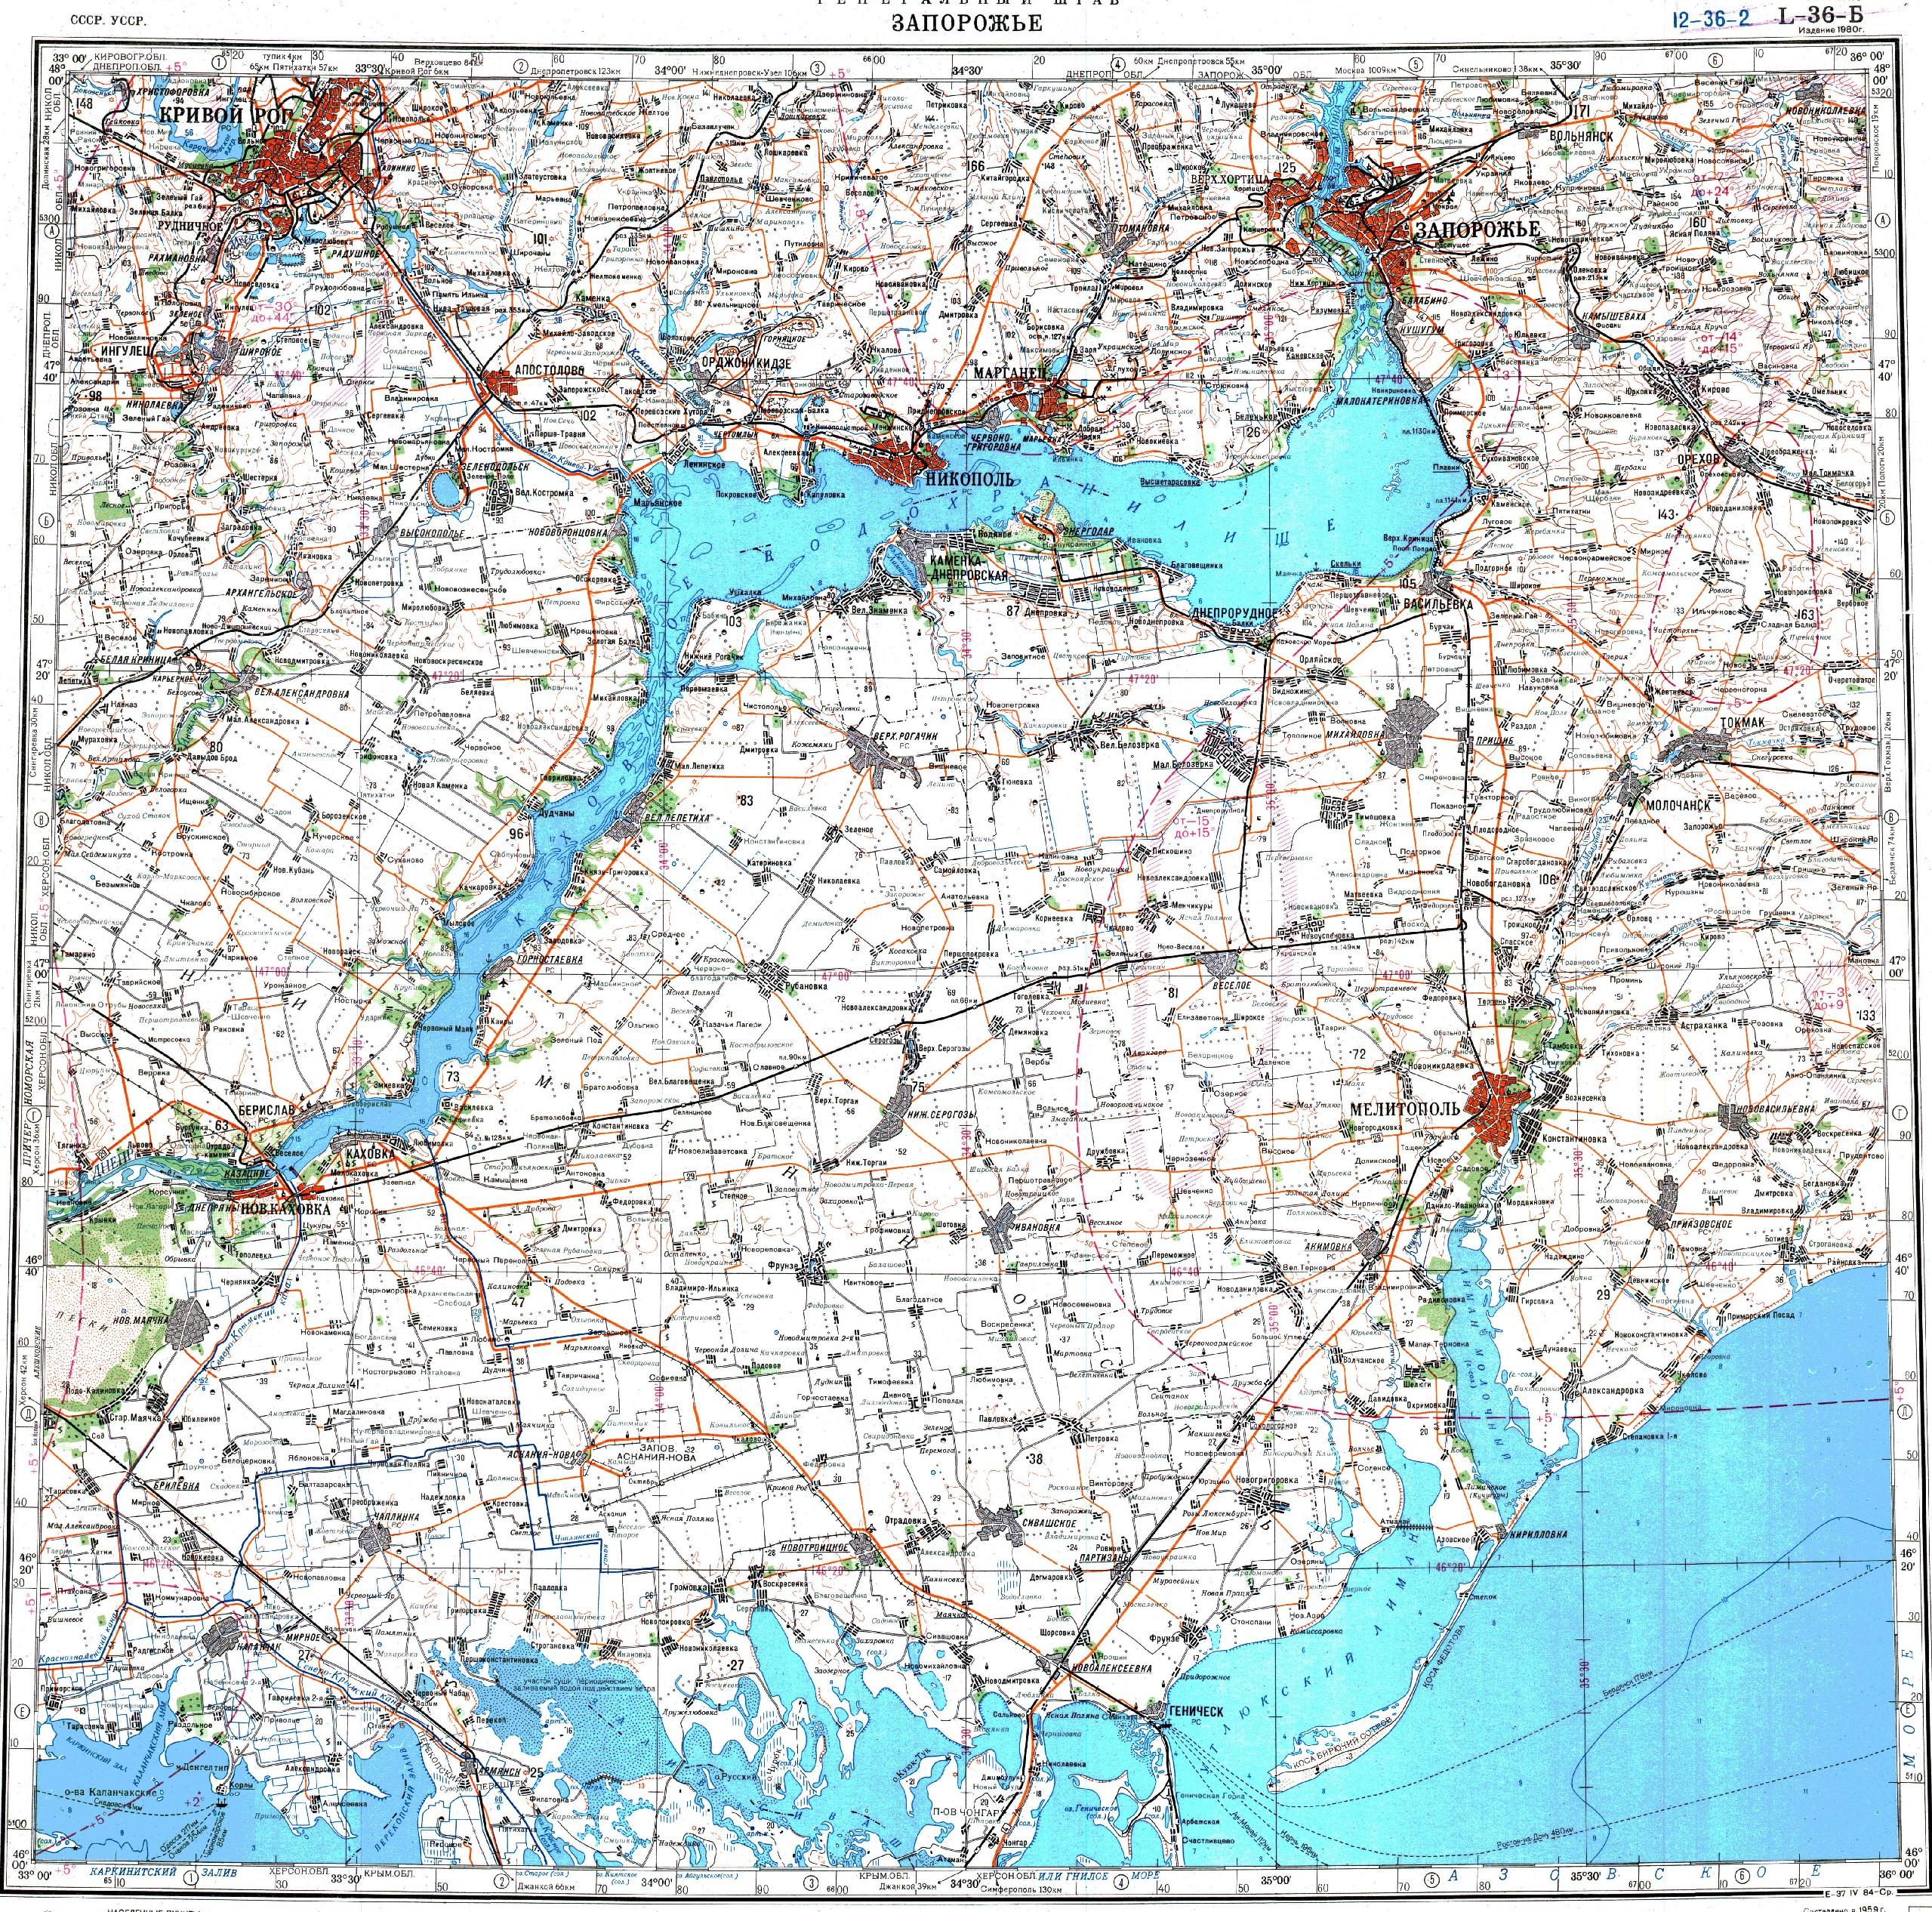 Kryvyi Rih Krivoj Rog Krzywy Rg Yurivka detailed paper map